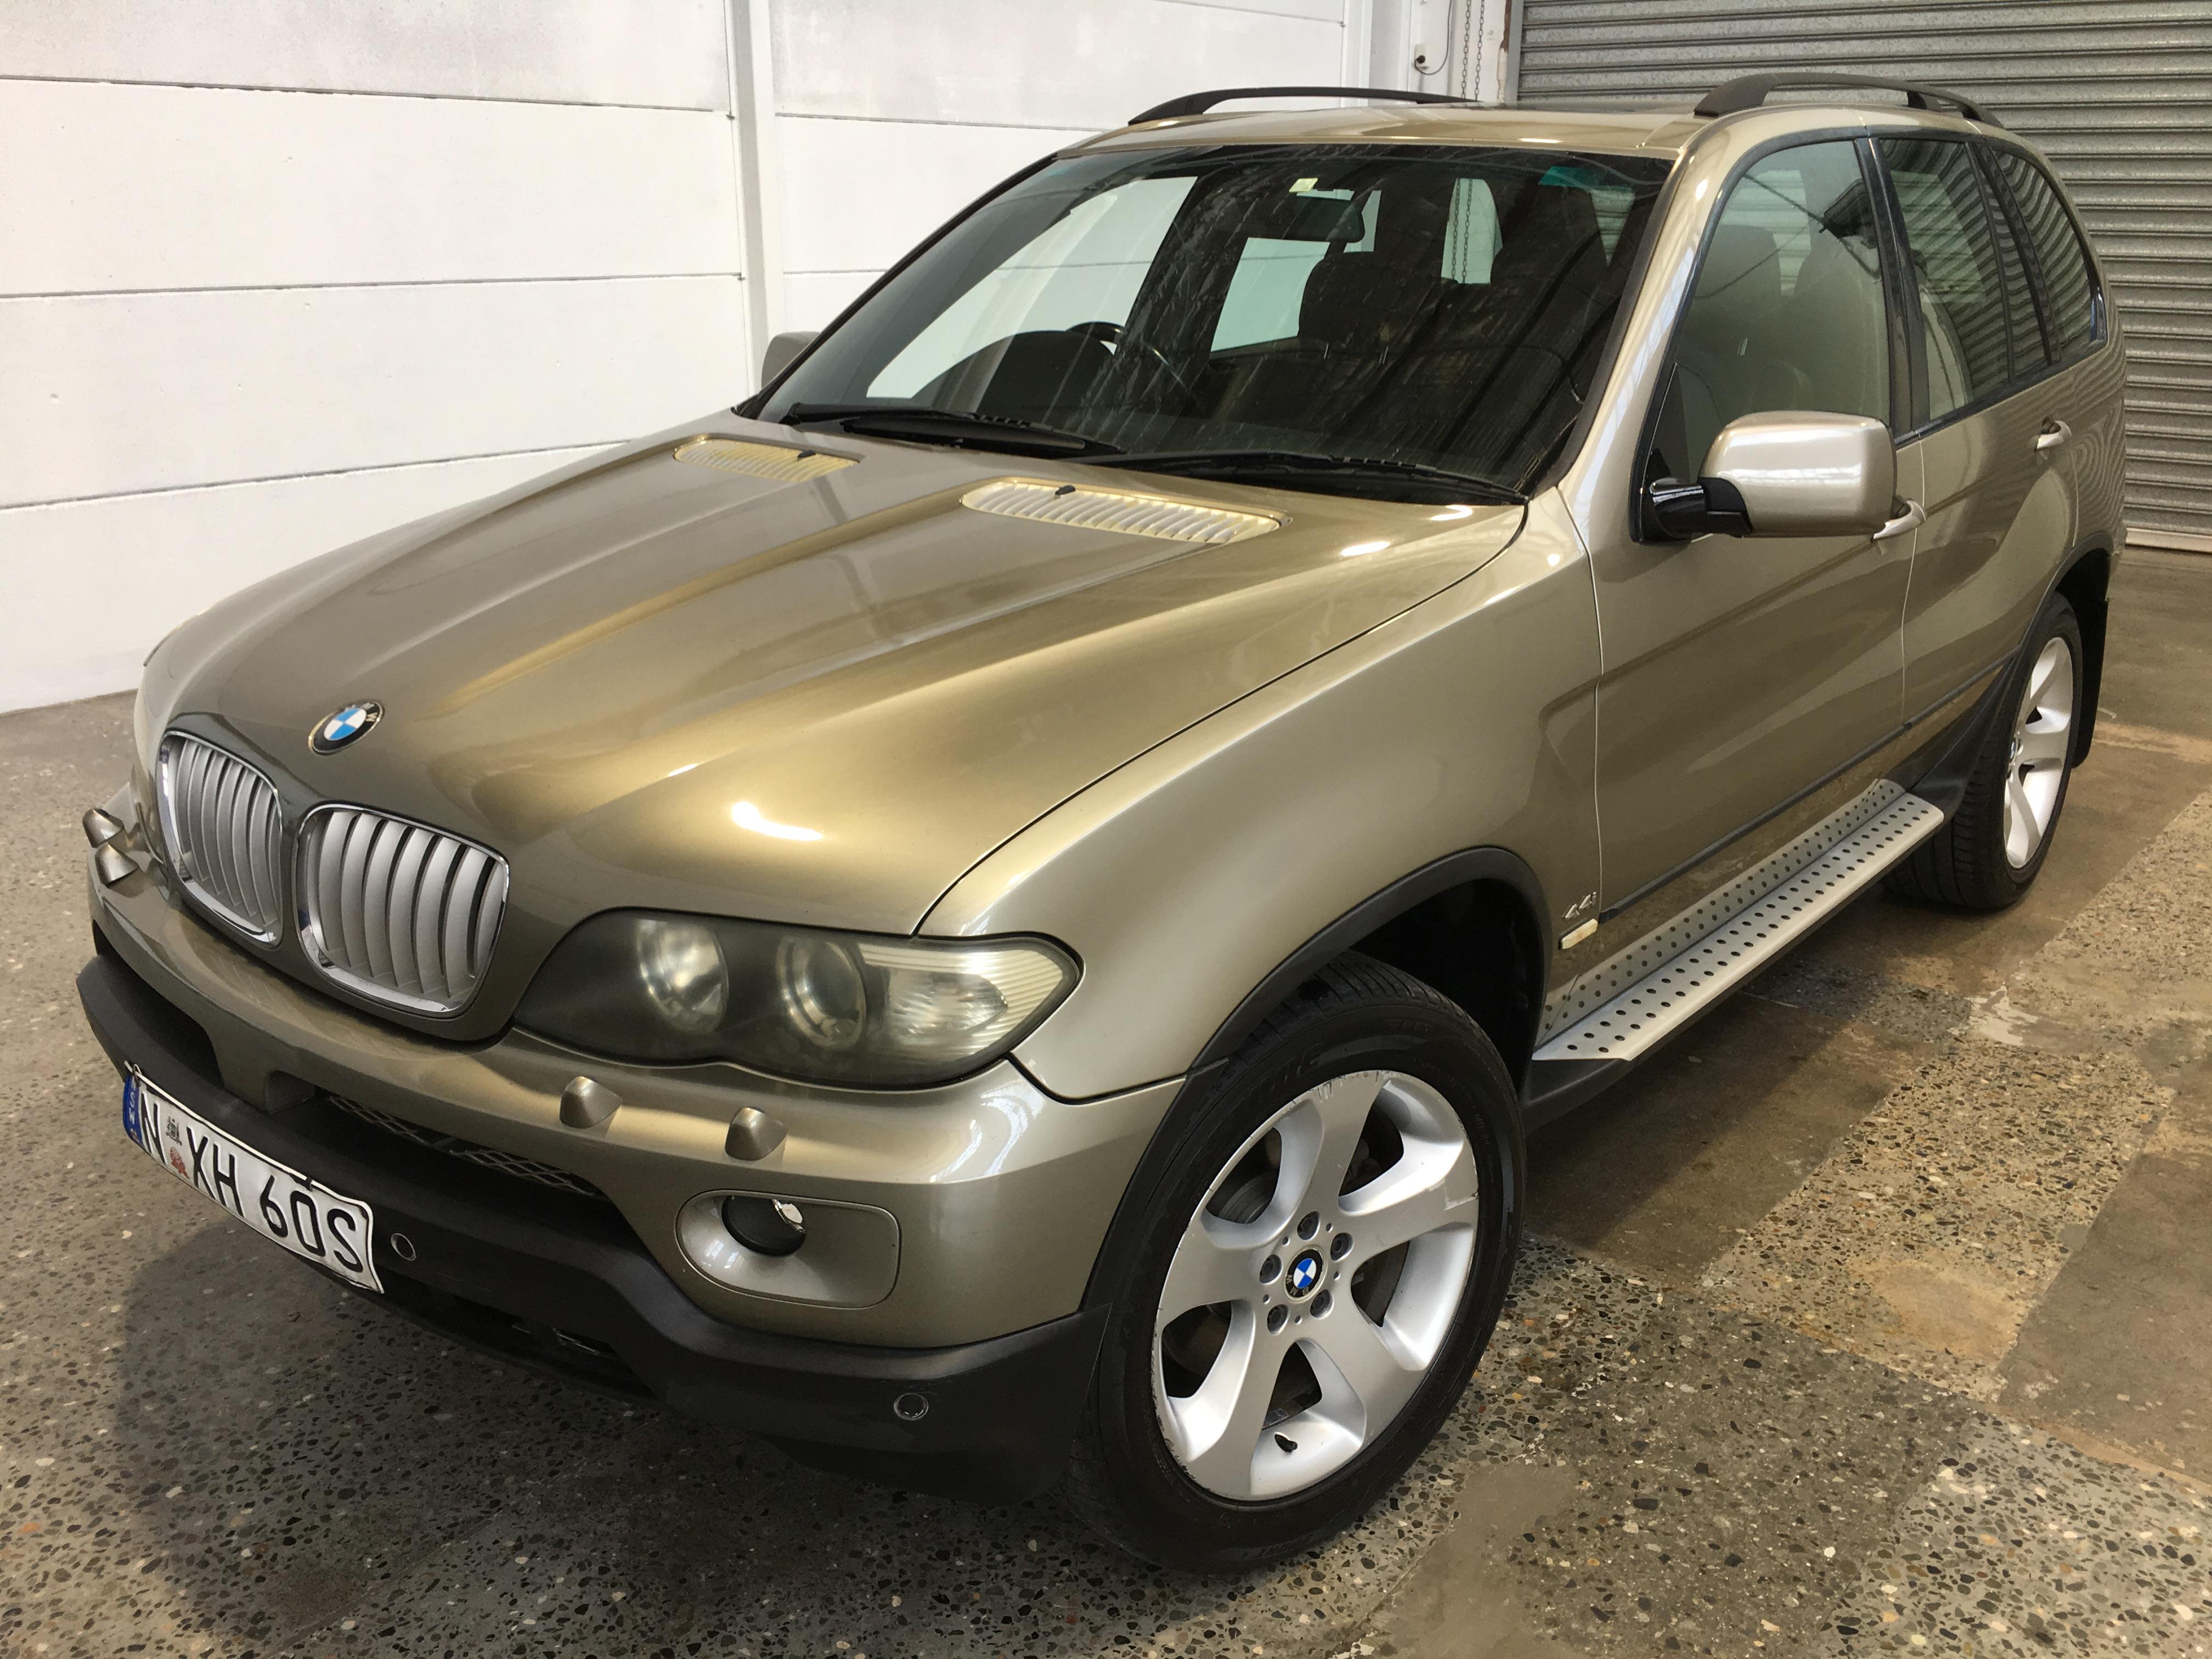 2004 BMW X5 4.4i E53 Automatic Wagon